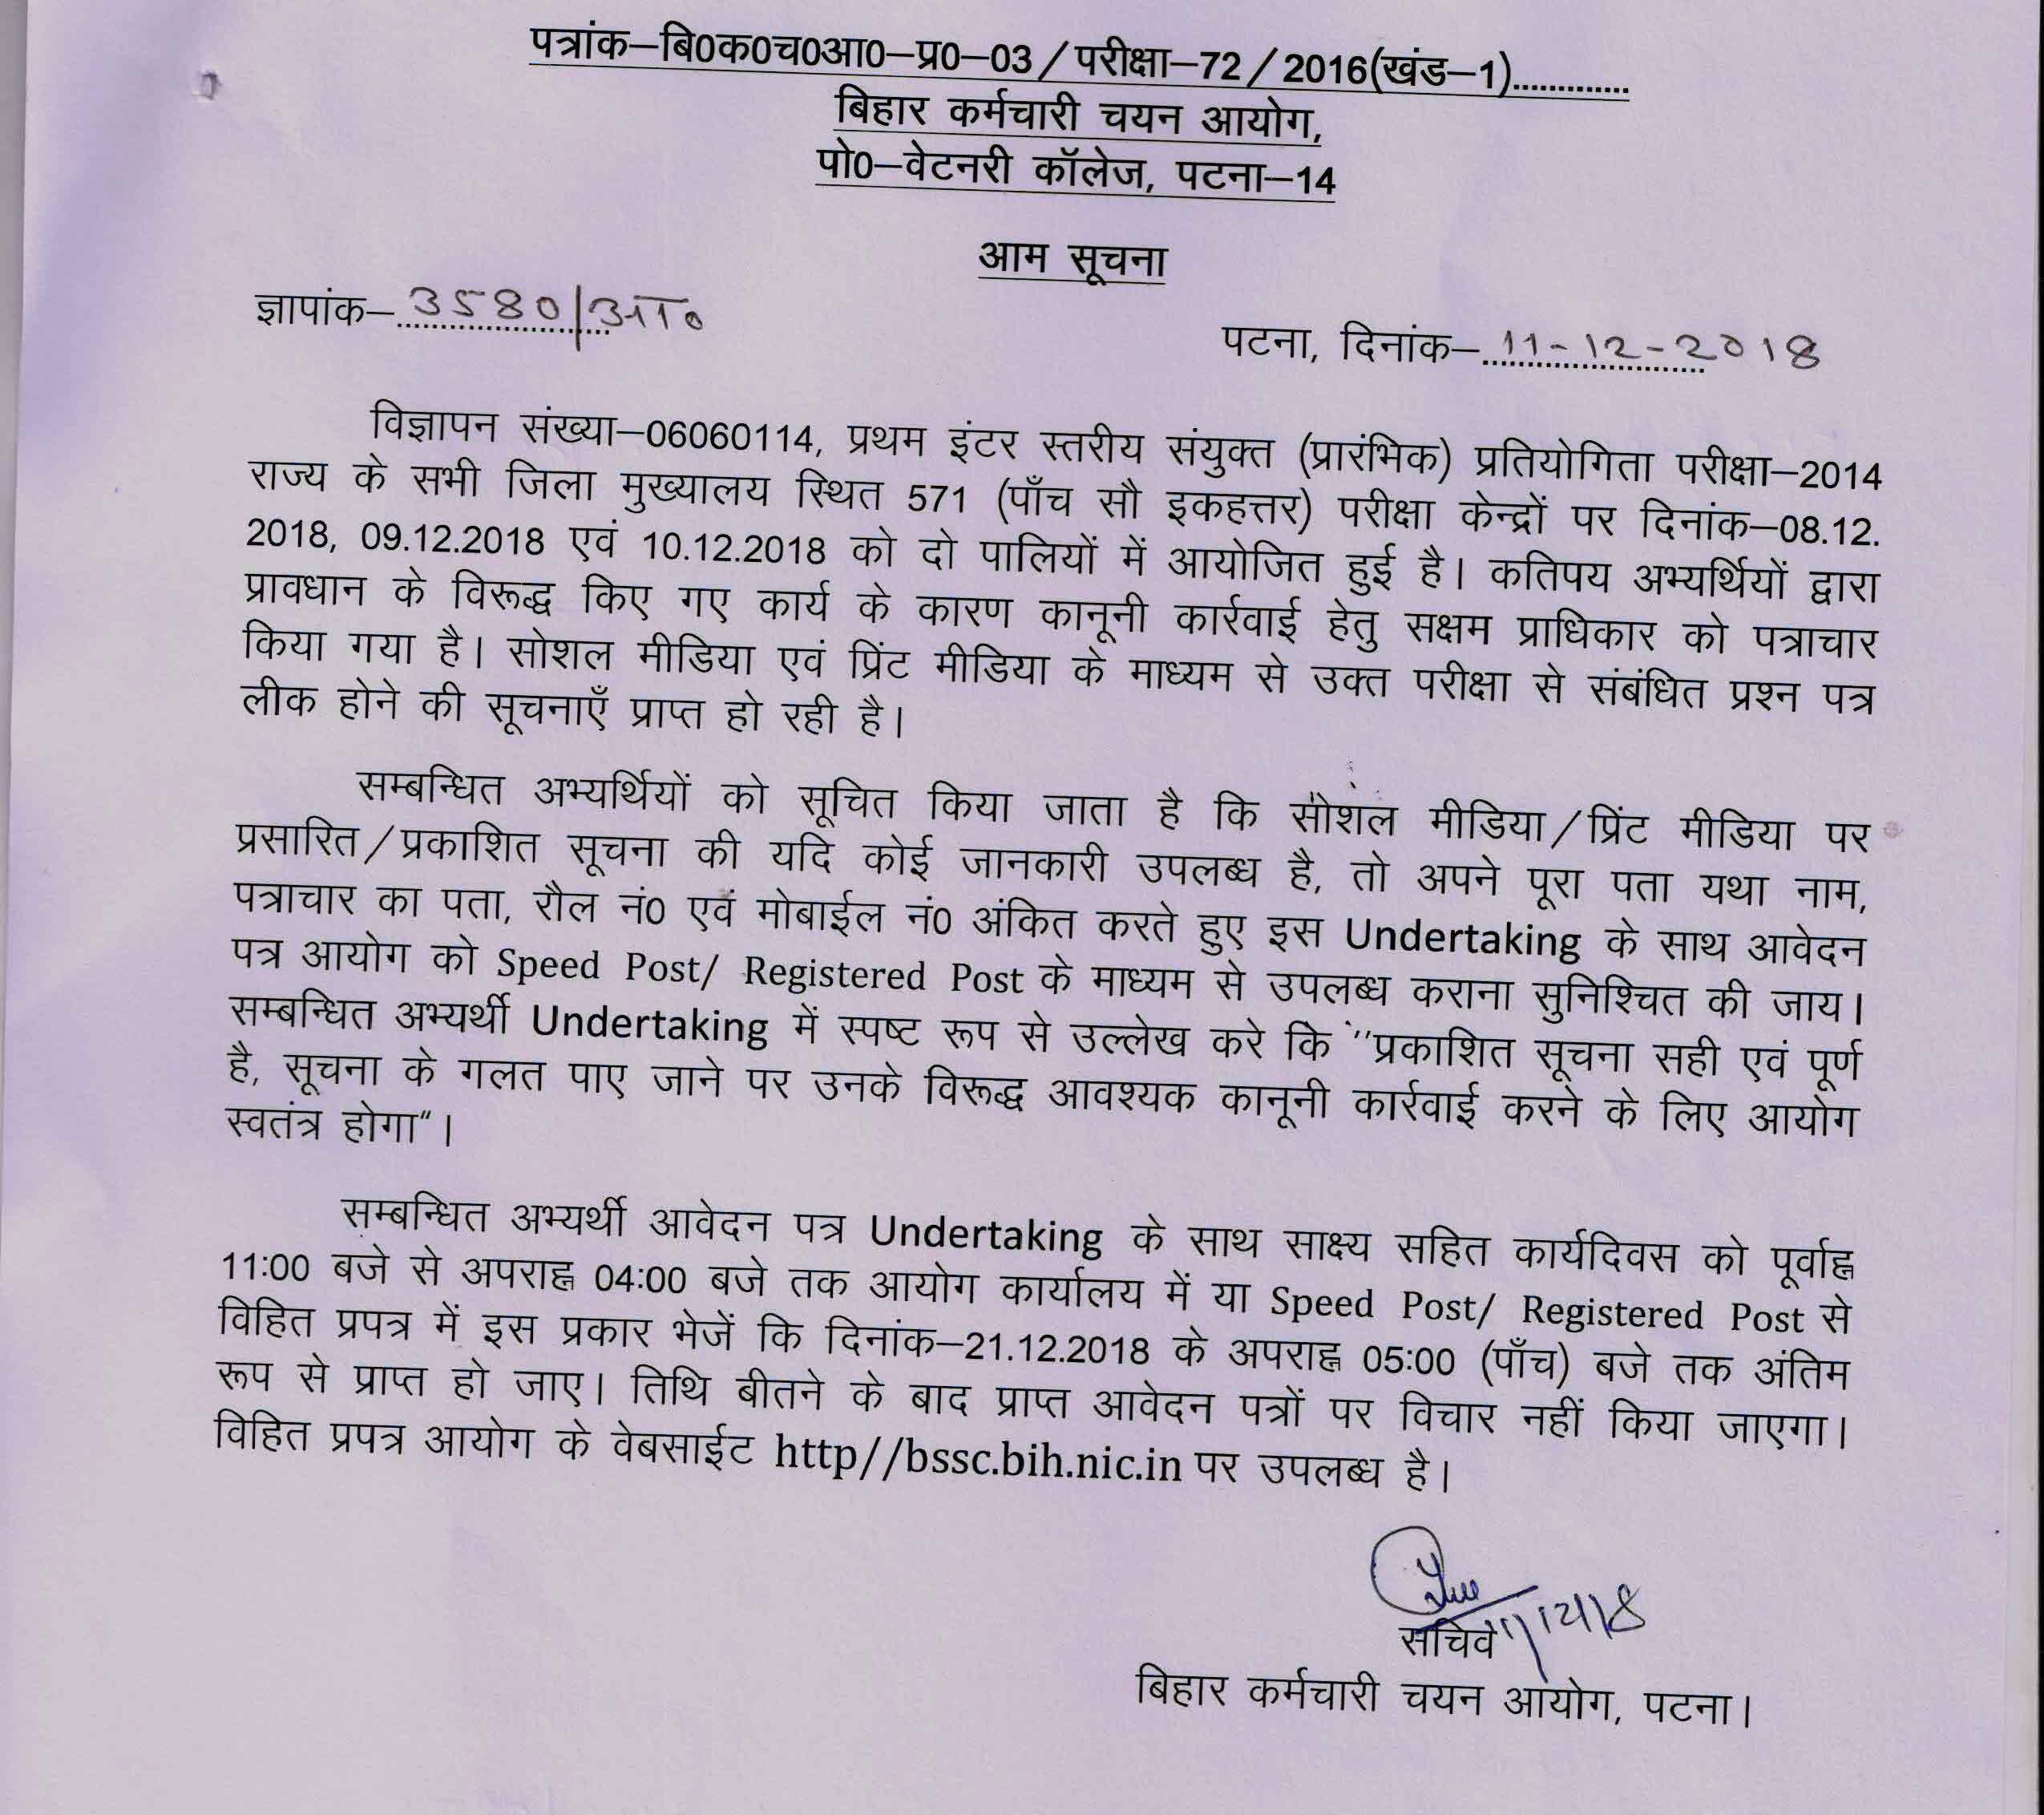 Bihar SSC Exam related notification 2018